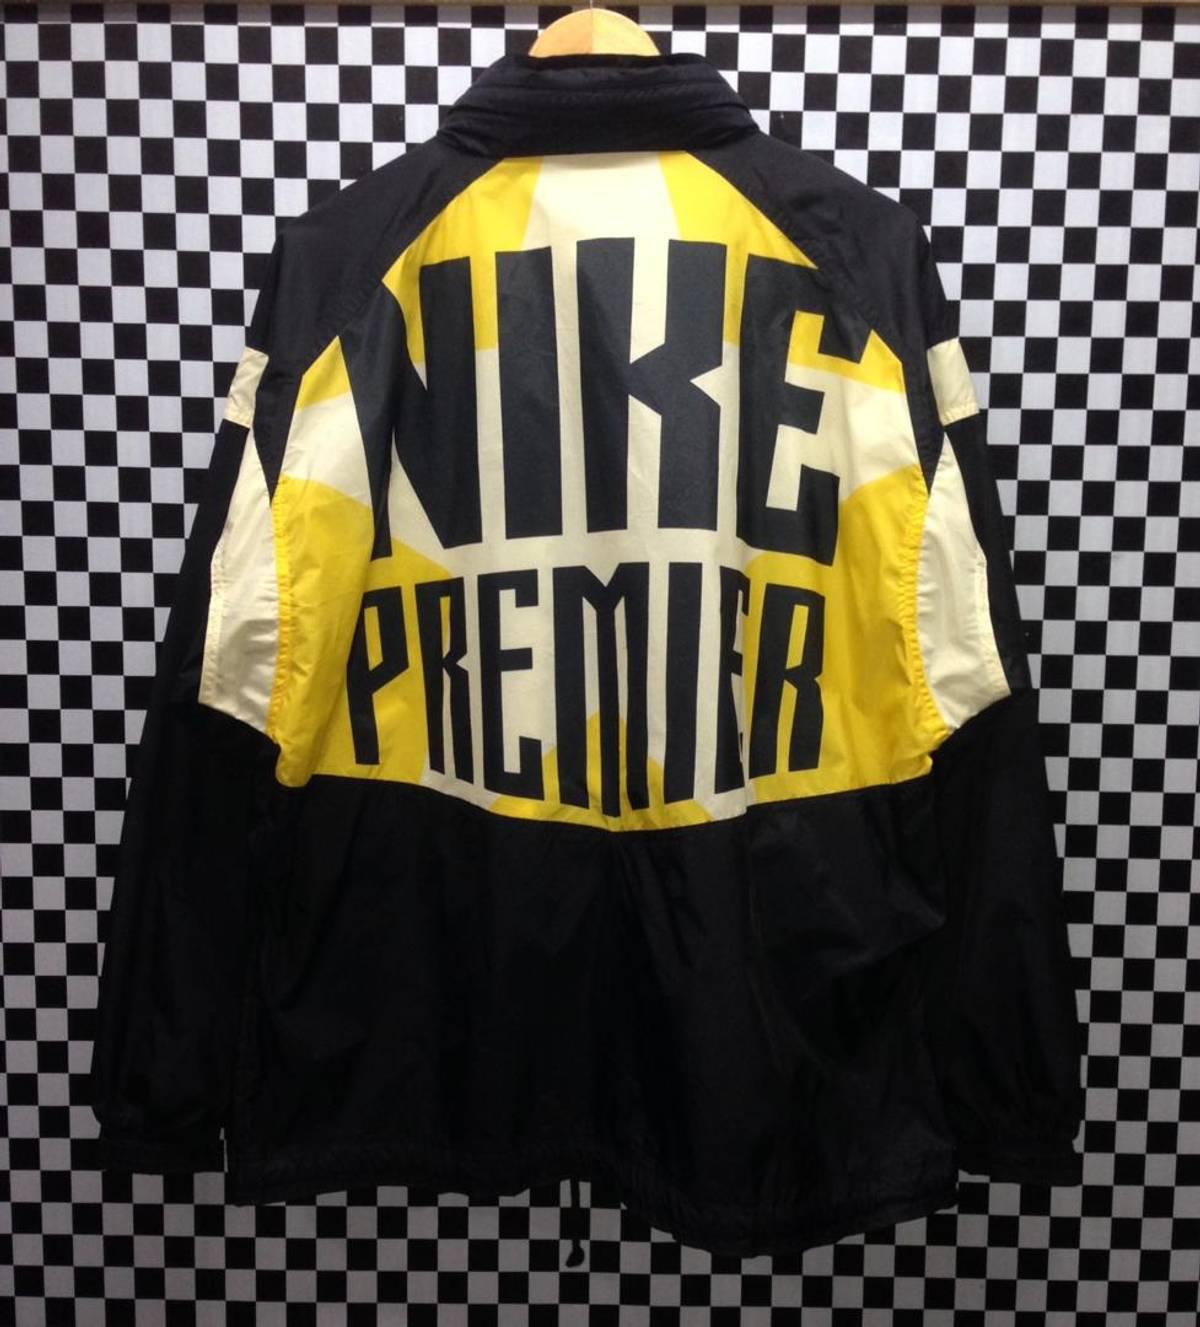 Nike Nike Premier Borussia Dortmund Windbreaker Track Jacket Grailed